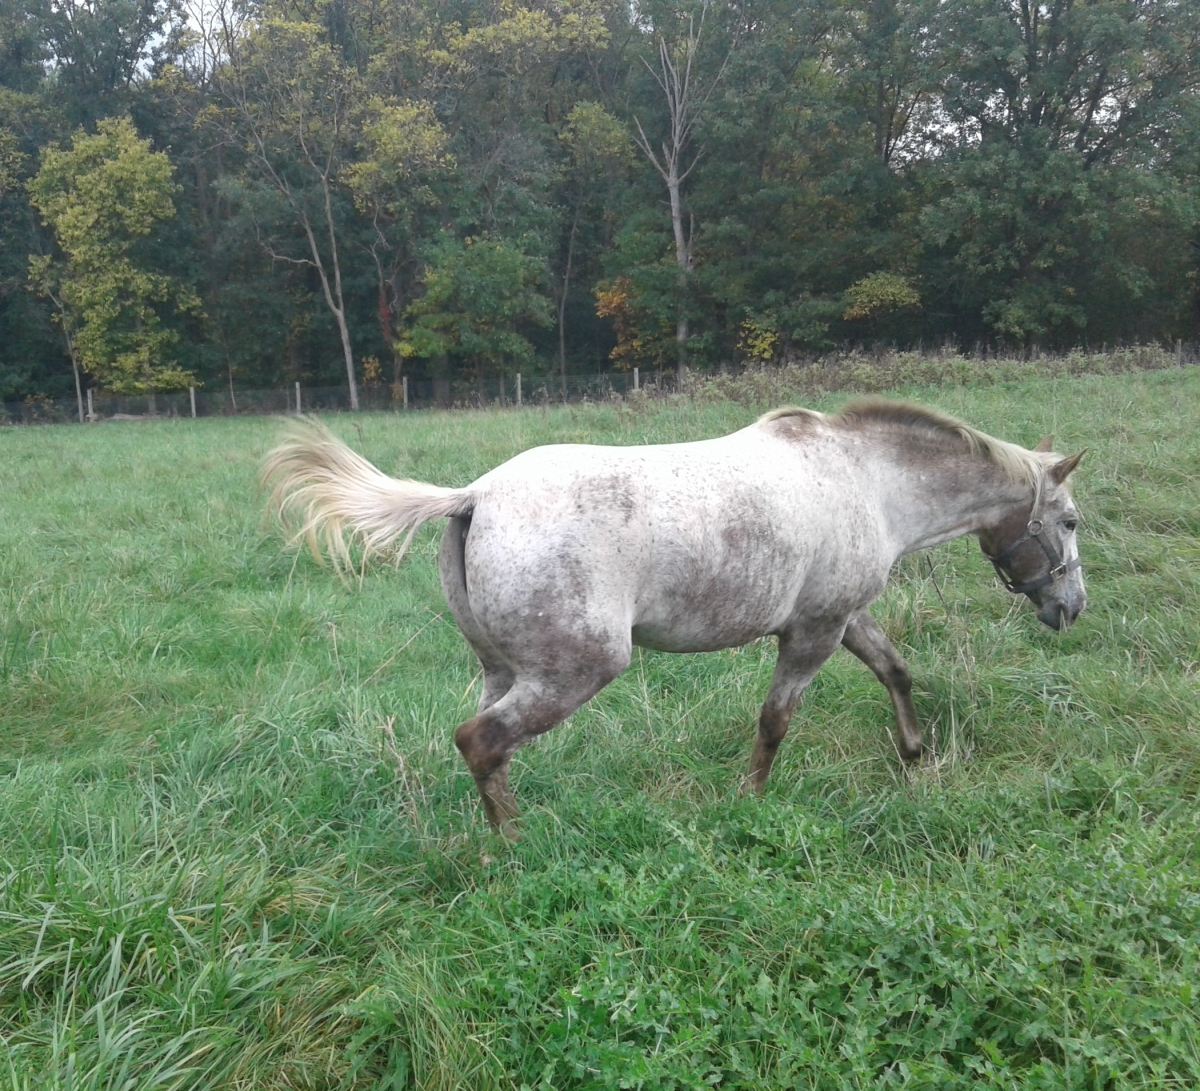 Gray horse walking